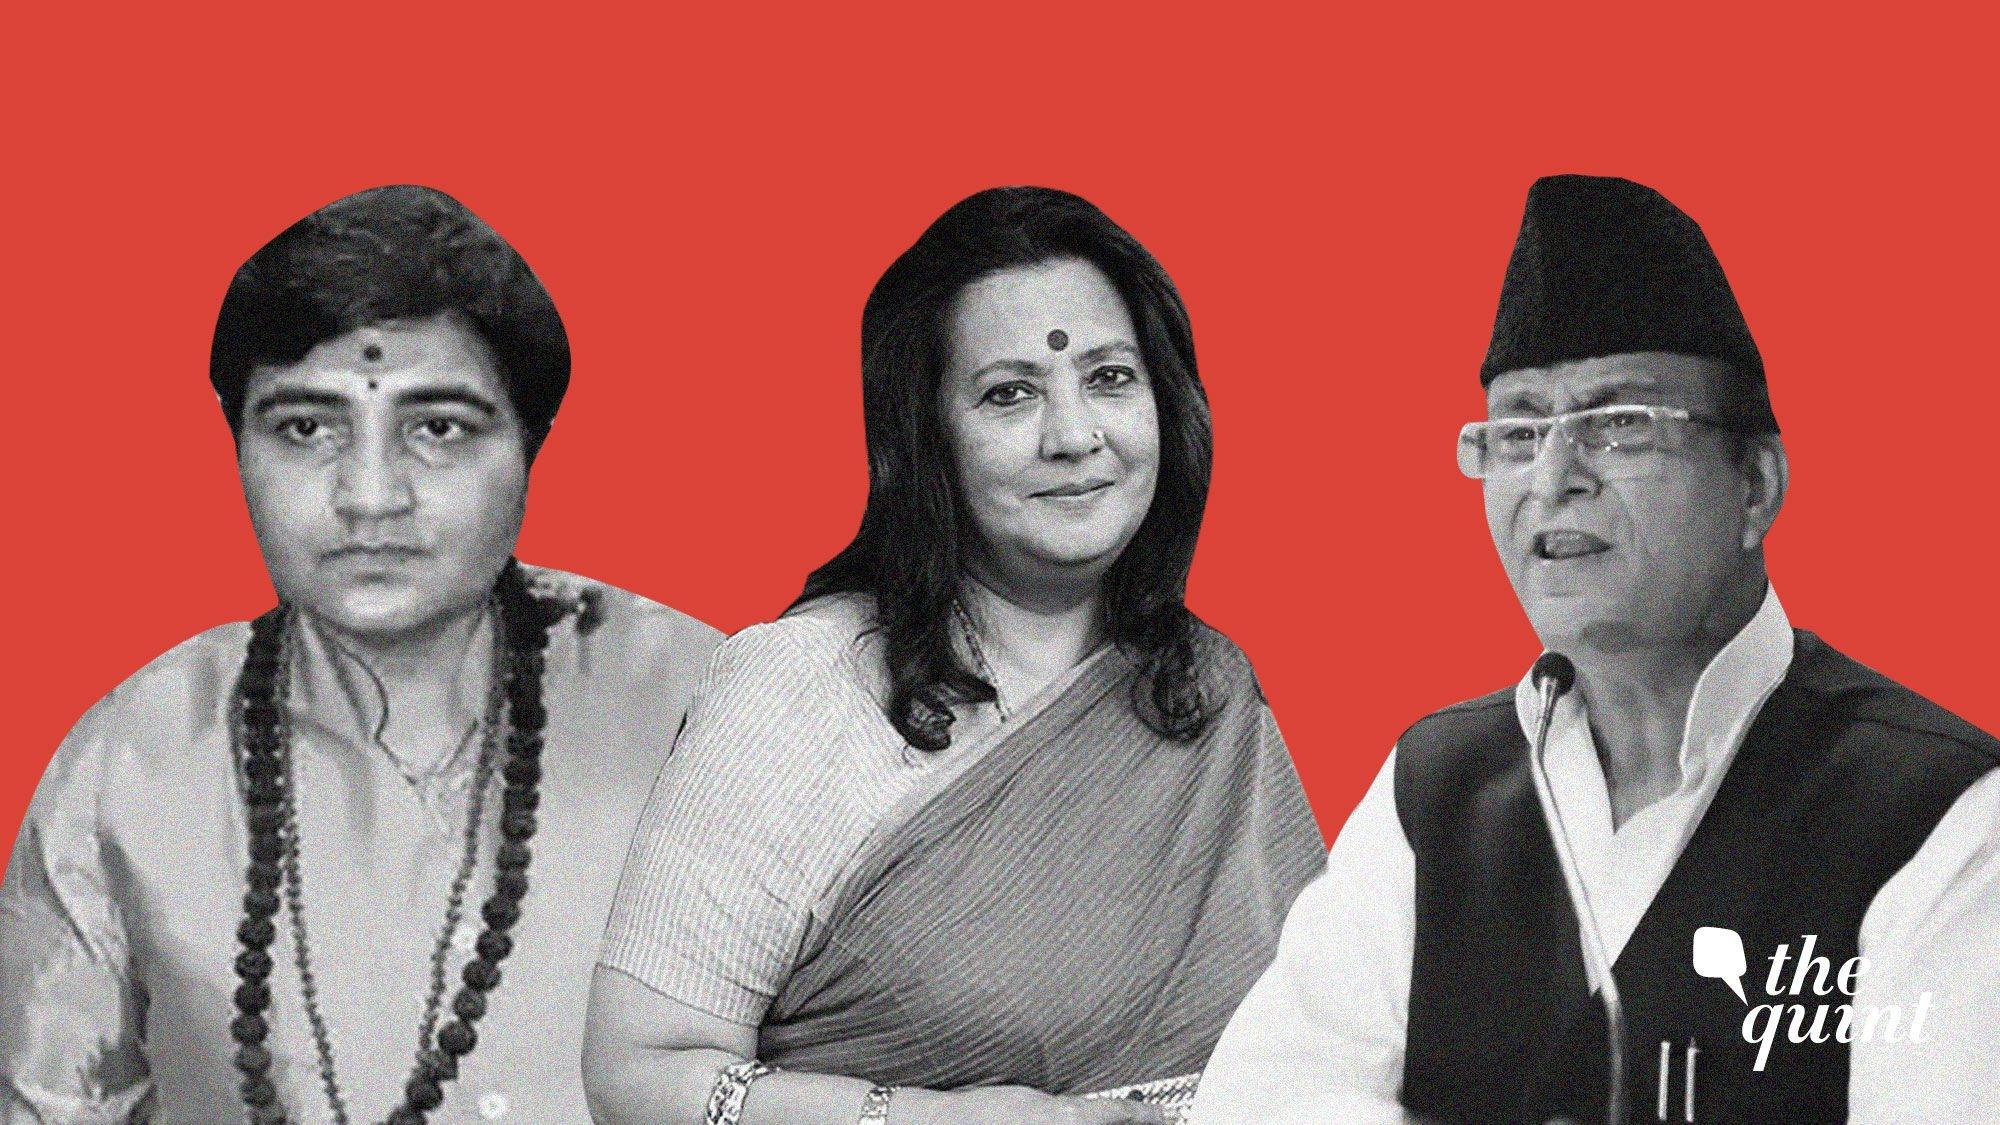 Pragya, Azam Khan, Sen: Those Who Made Headlines With Their Views